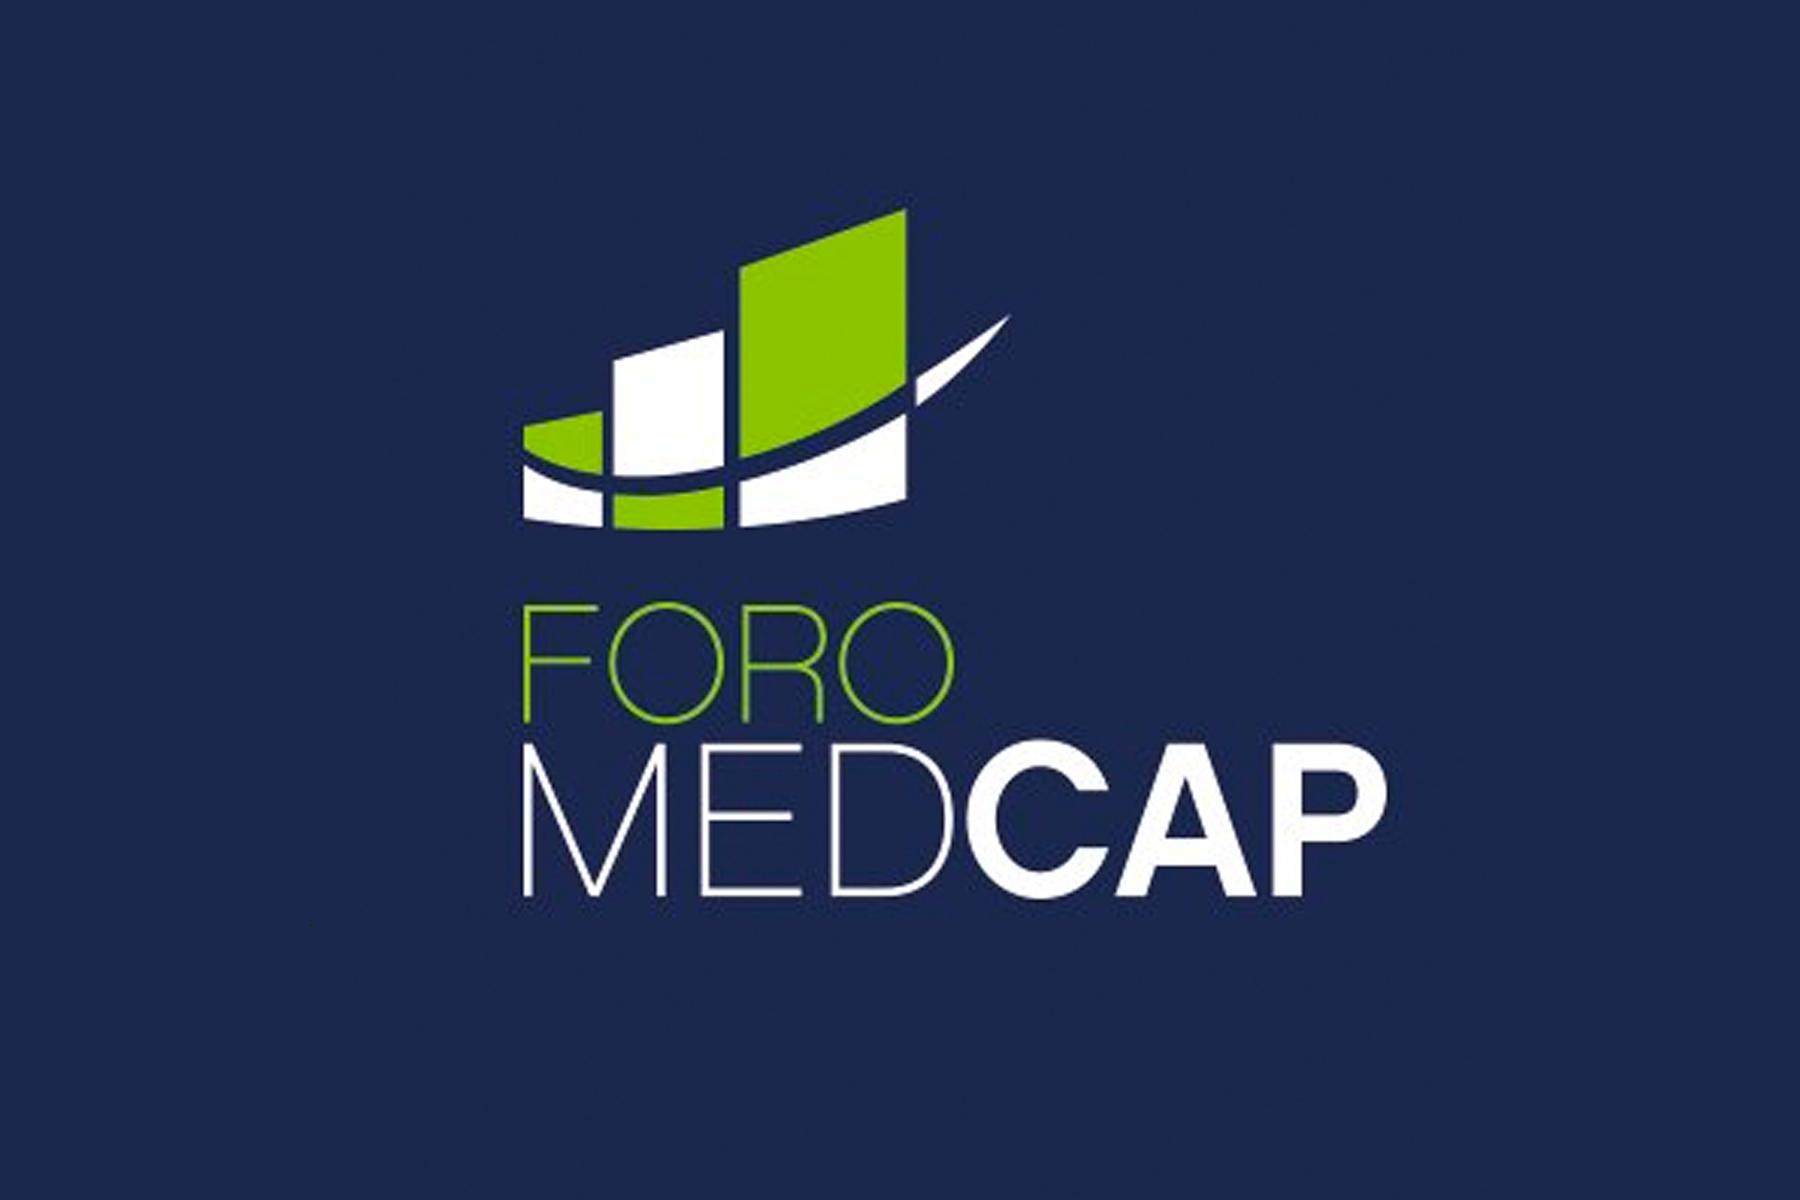 Our participation in the MEDCAP 2020 Forum